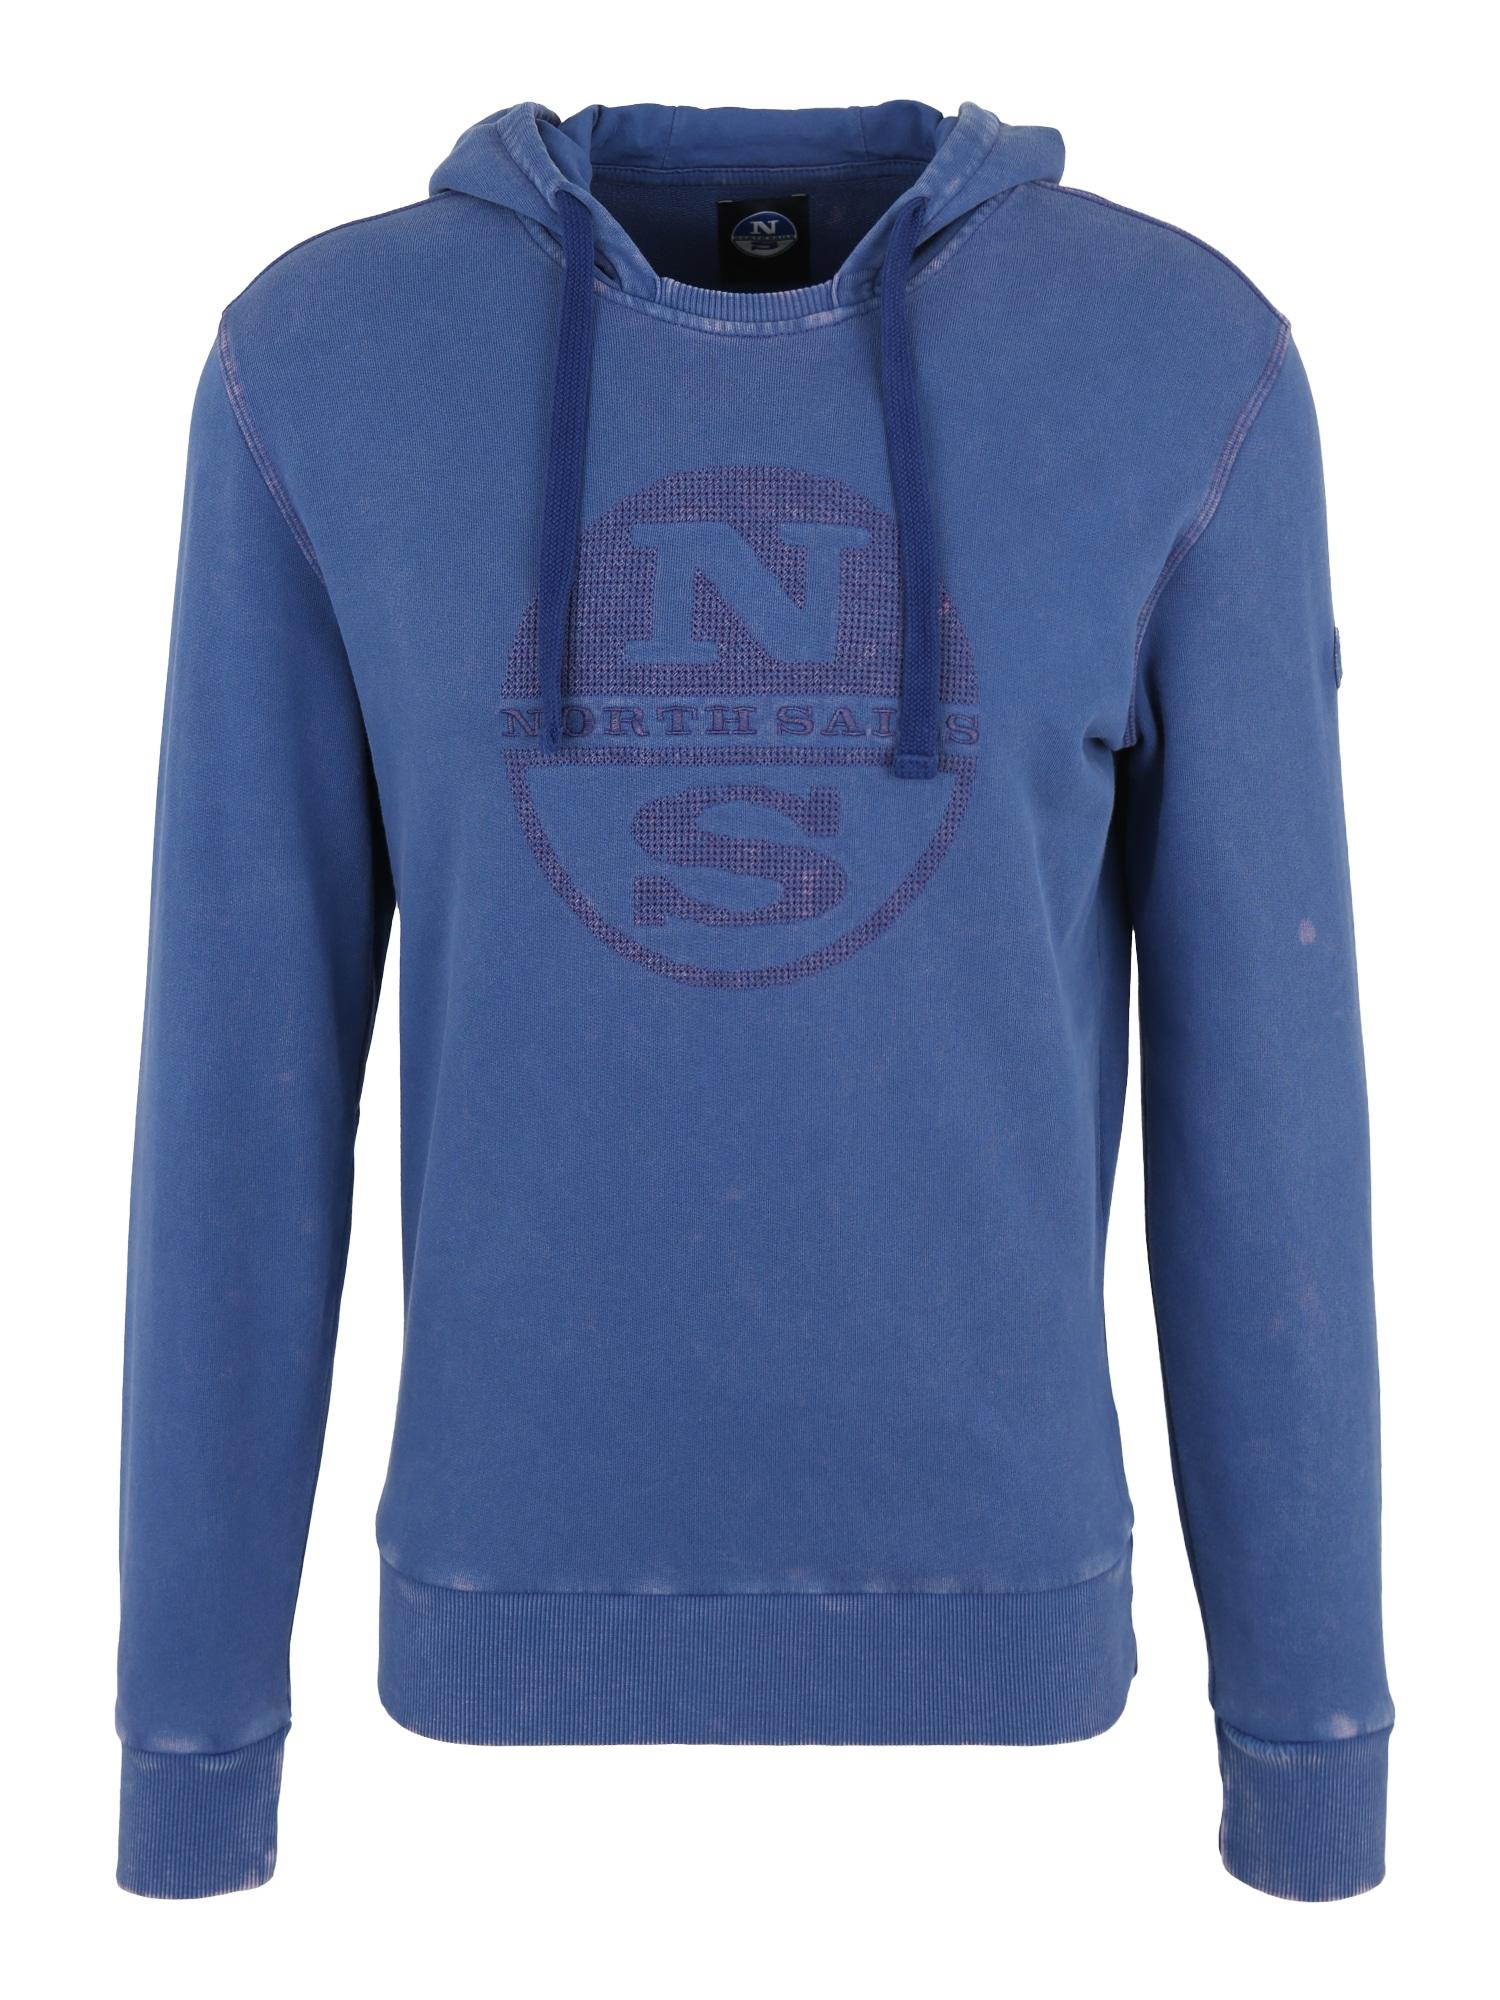 Sportovní mikina HOODED SWEAT WGRAPHIC modrá North Sails